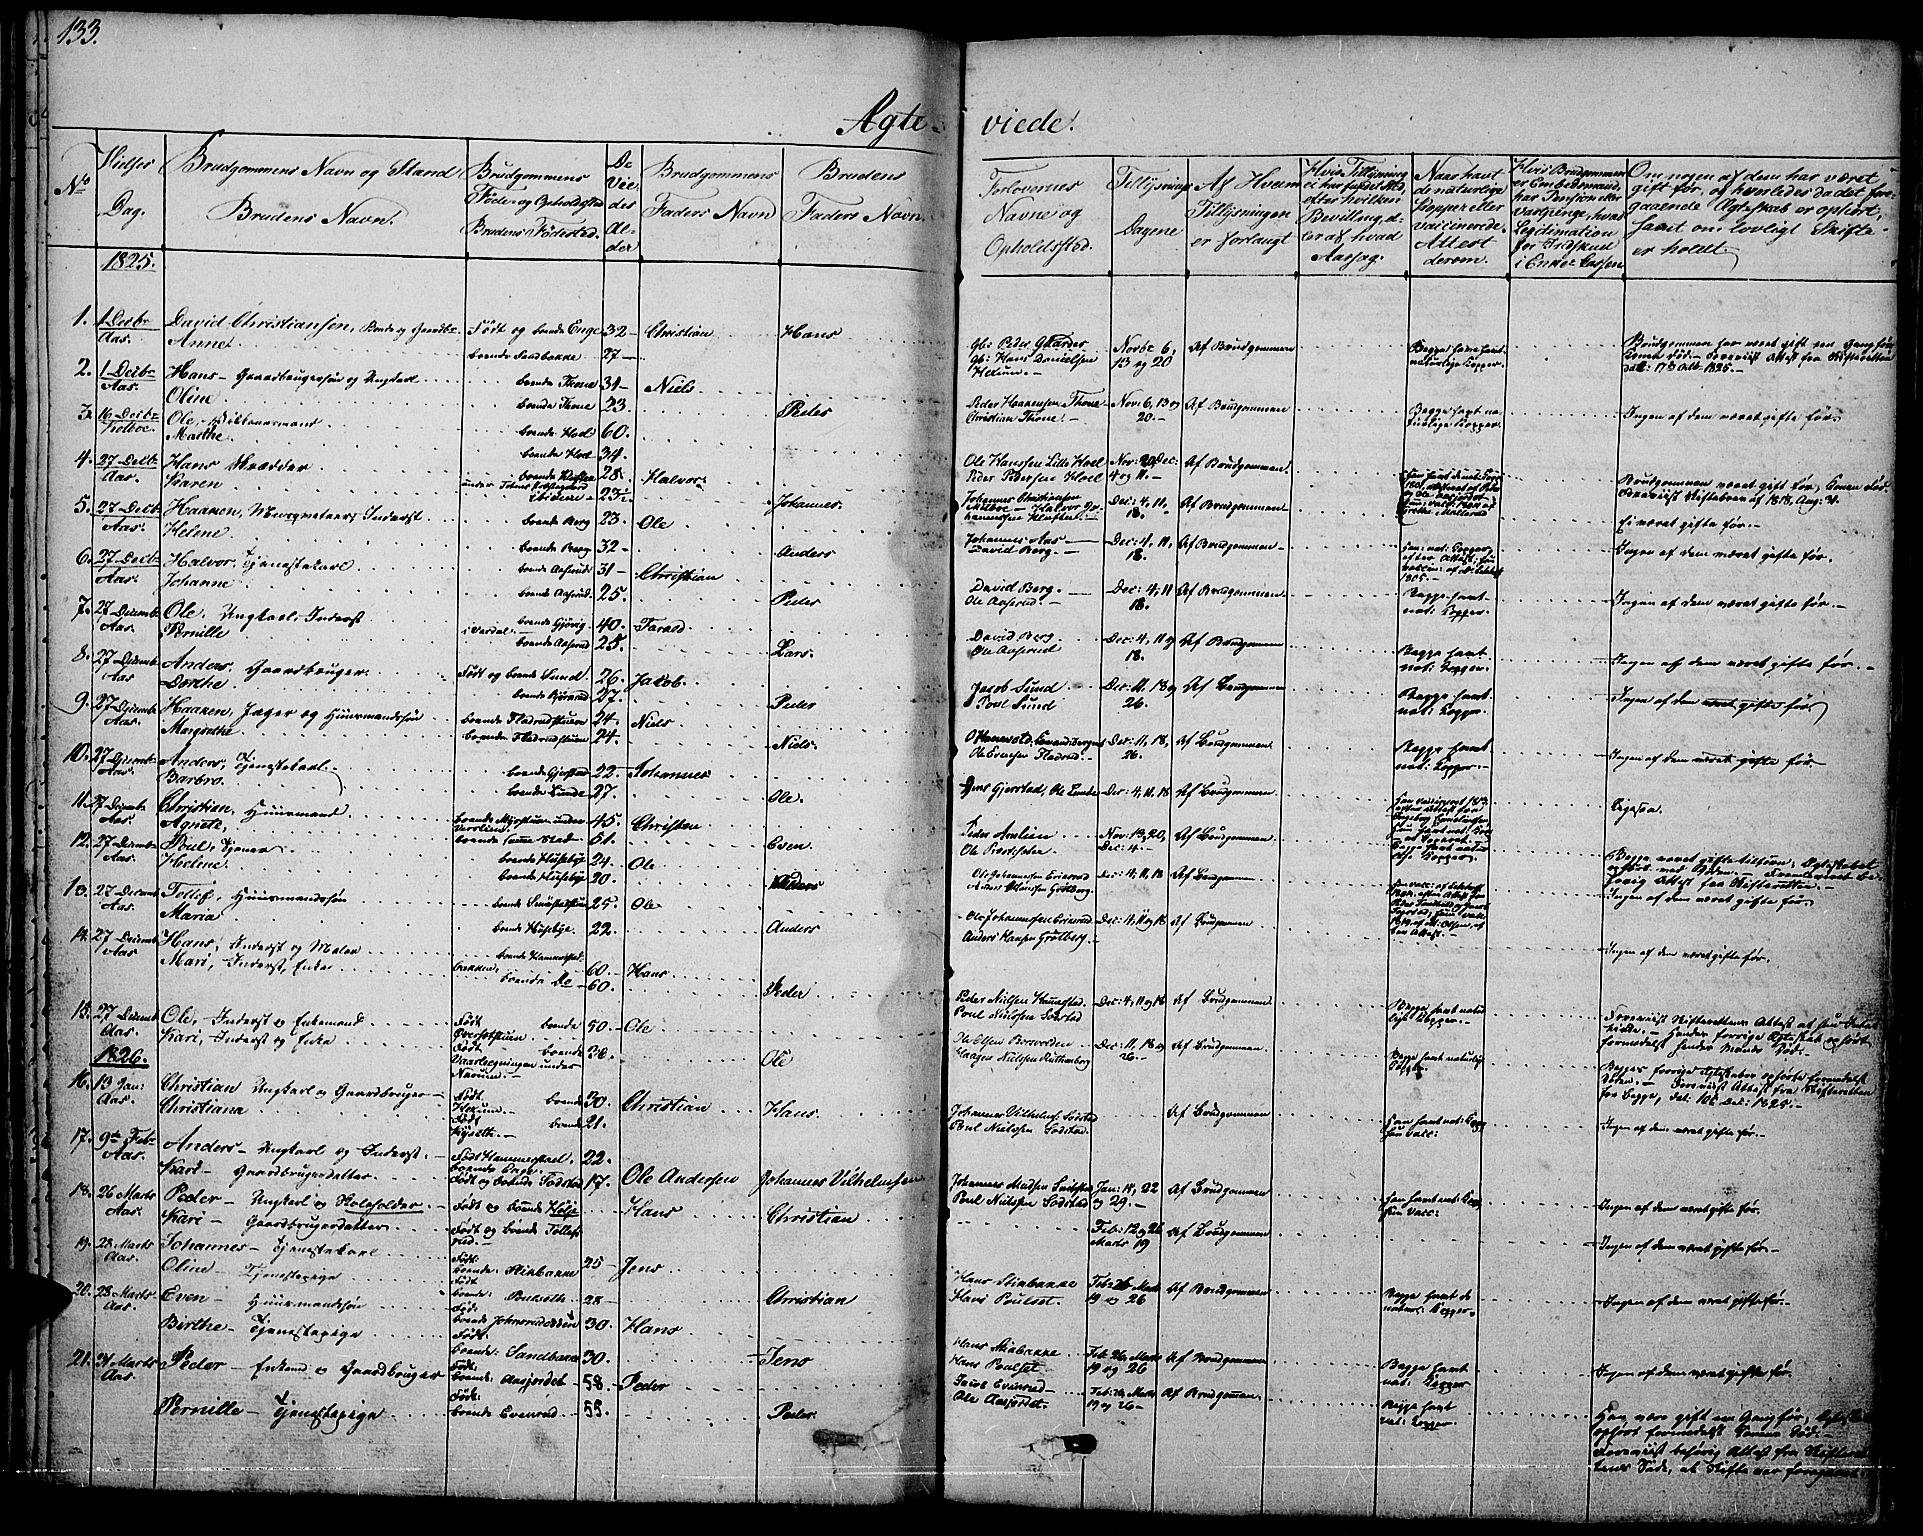 SAH, Vestre Toten prestekontor, H/Ha/Haa/L0002: Ministerialbok nr. 2, 1825-1837, s. 133